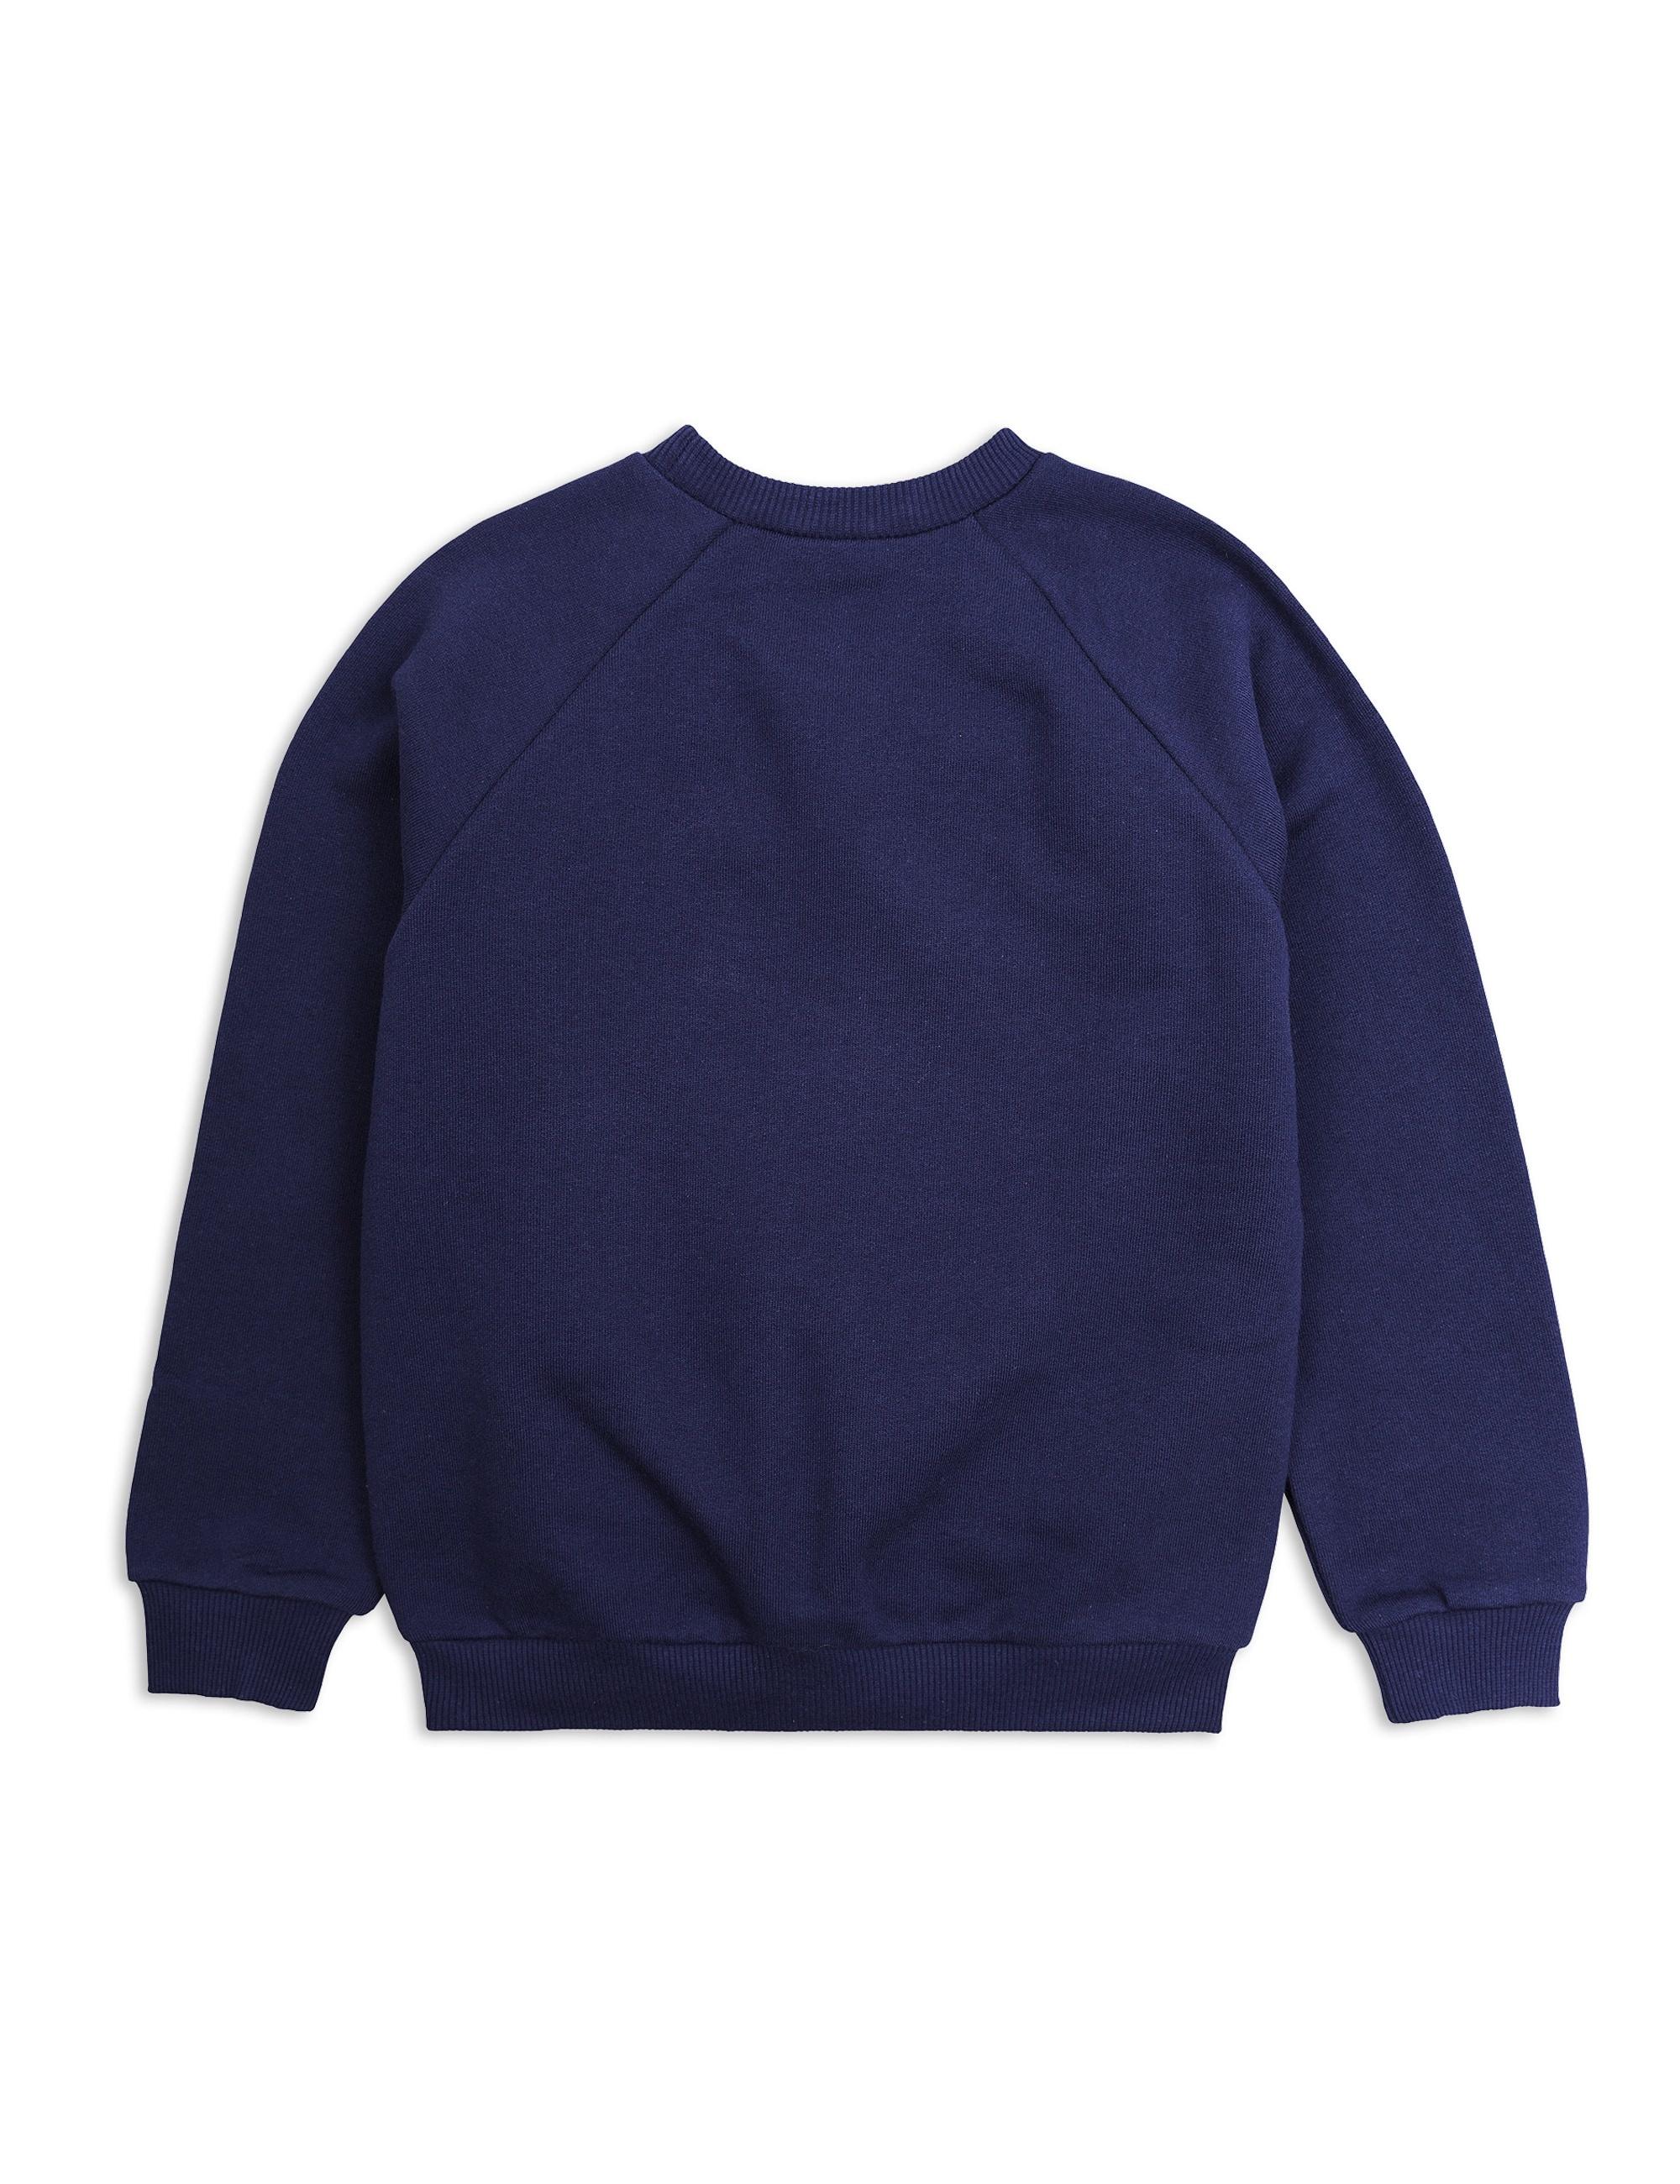 1822017167 2 mini rodini veggie sp sweatshirt navy